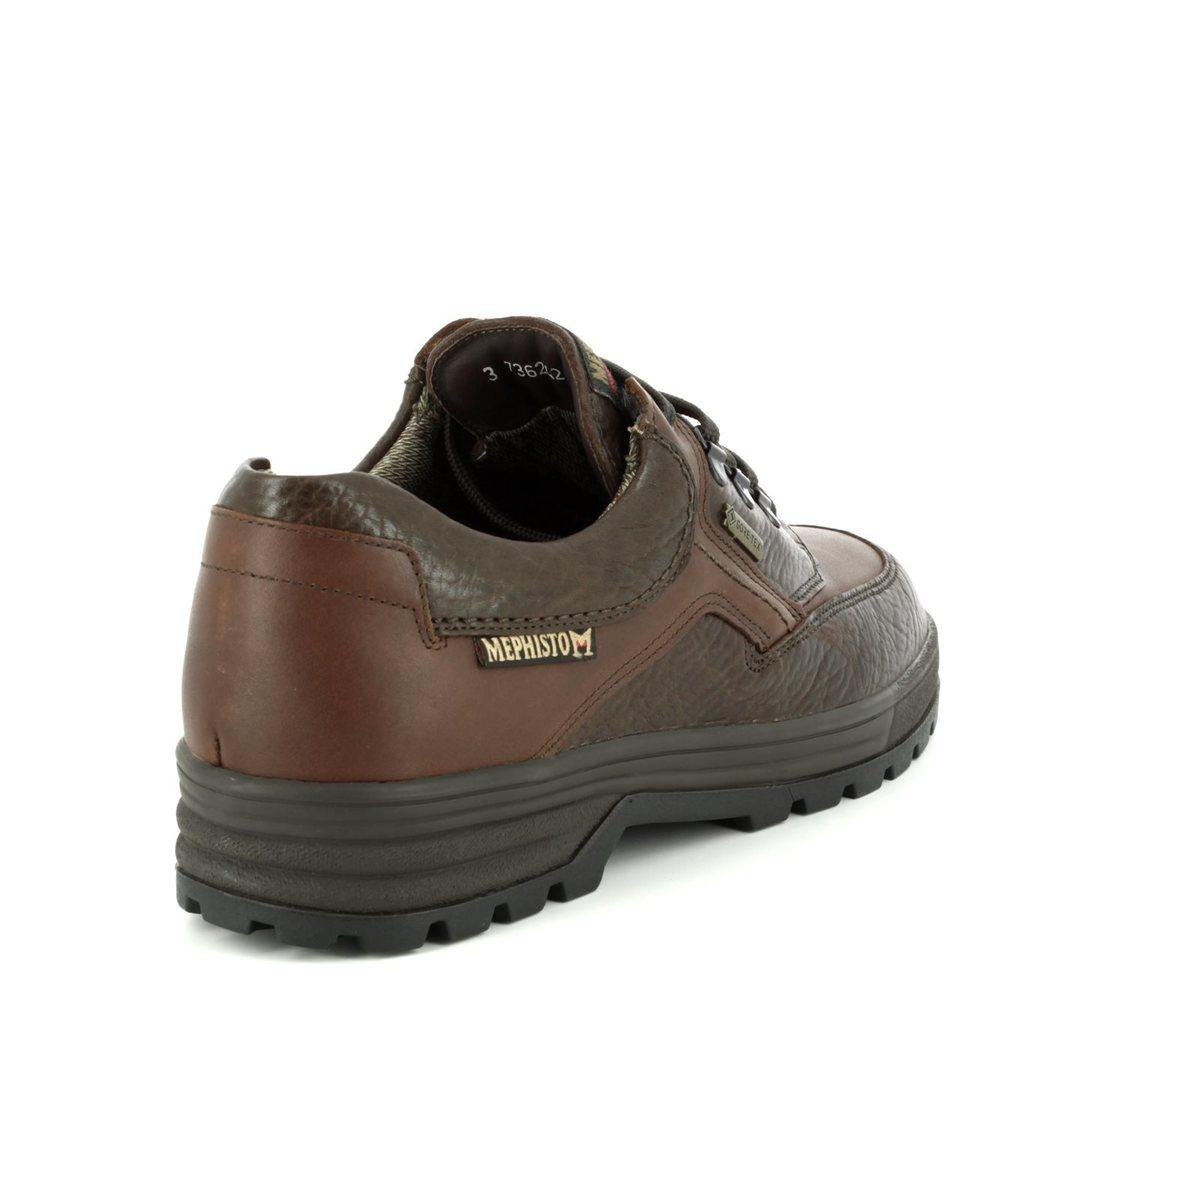 e0672e8a196782 Mephisto Casual Shoes - Dark brown - B818C85/751 BARRACUDA GORE-TEX